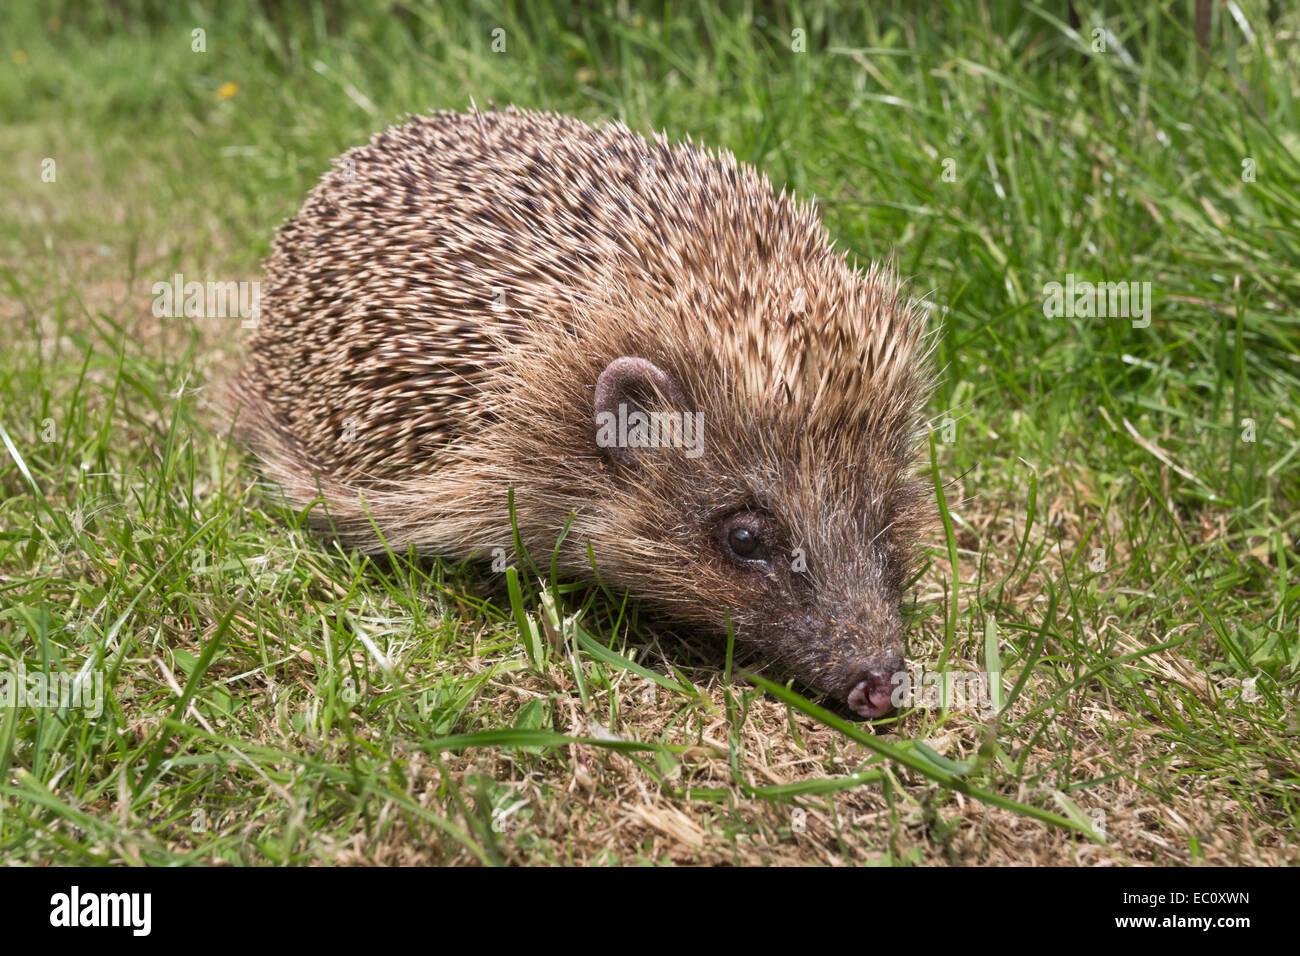 Hedgehog (Erinaceus europaeus), captive, UK - Stock Image